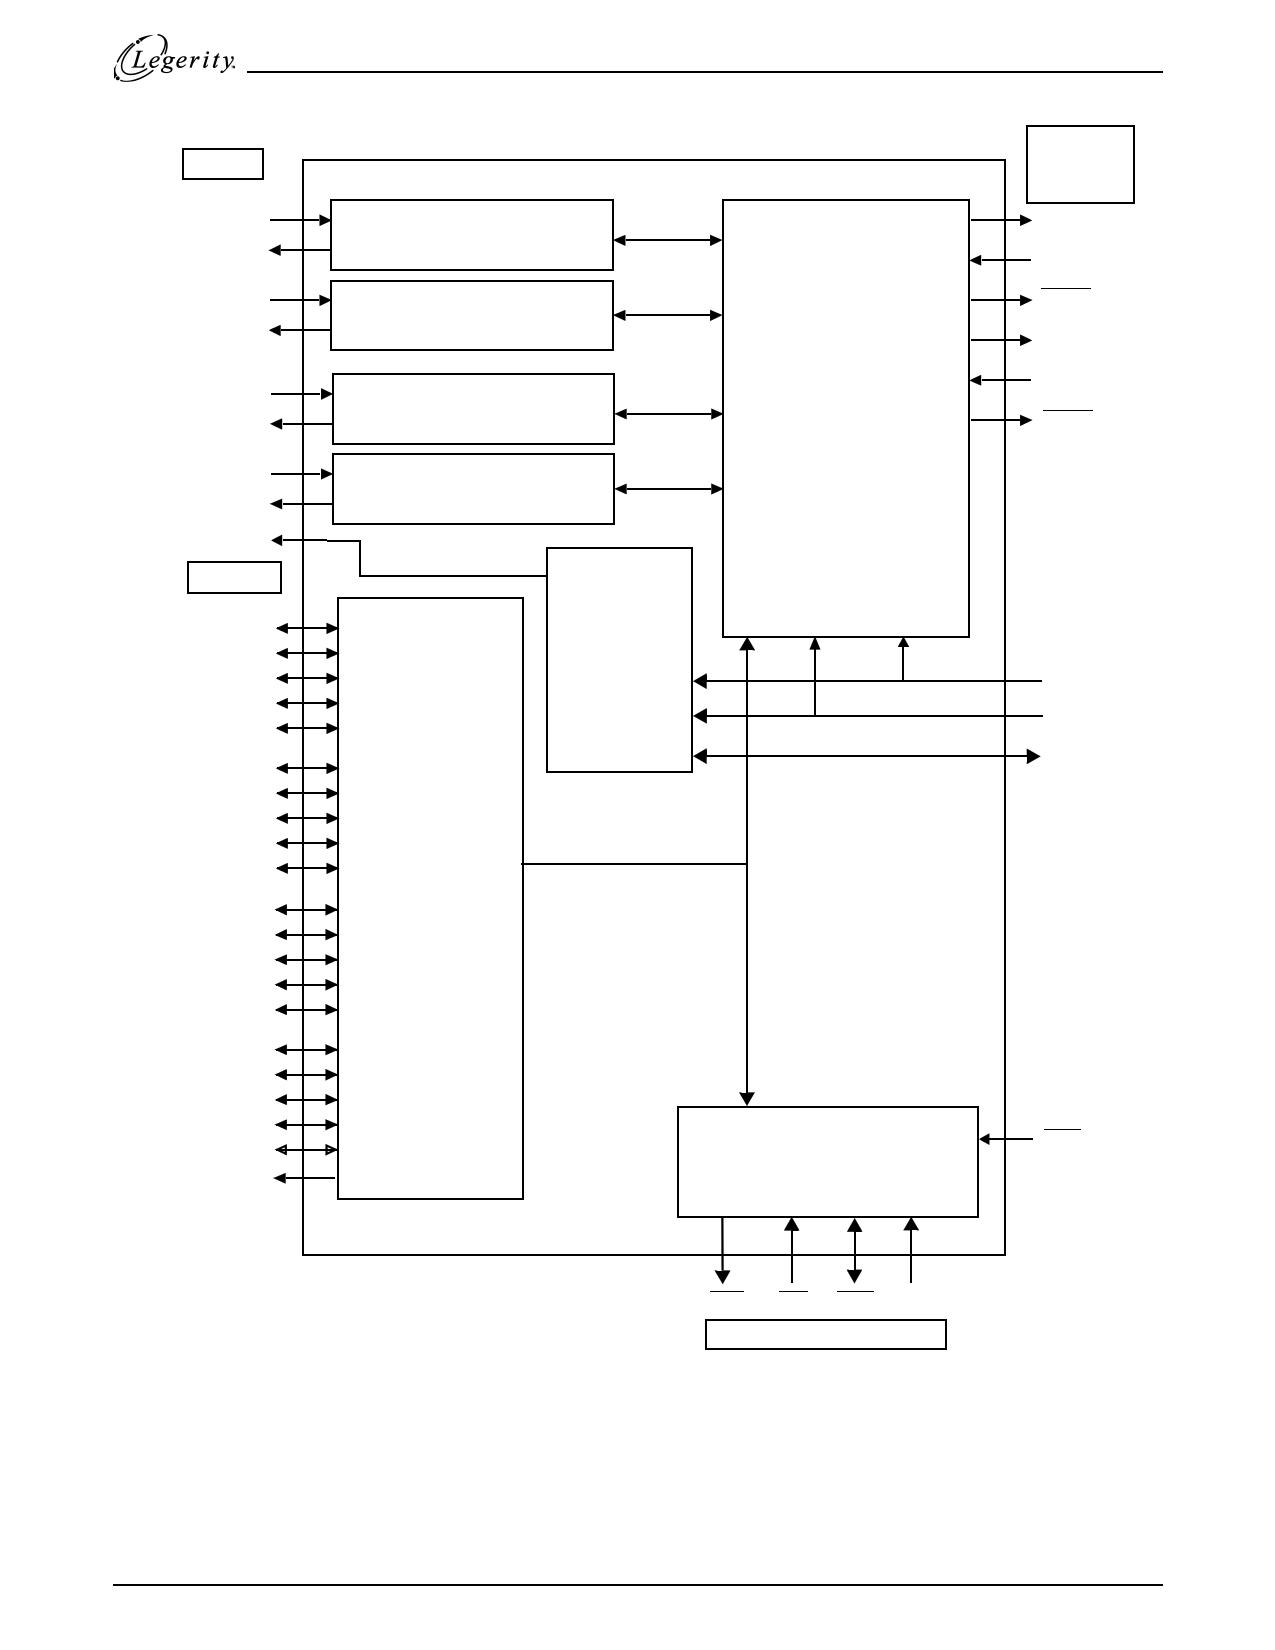 Am79Q021 pdf, 전자부품, 반도체, 판매, 대치품